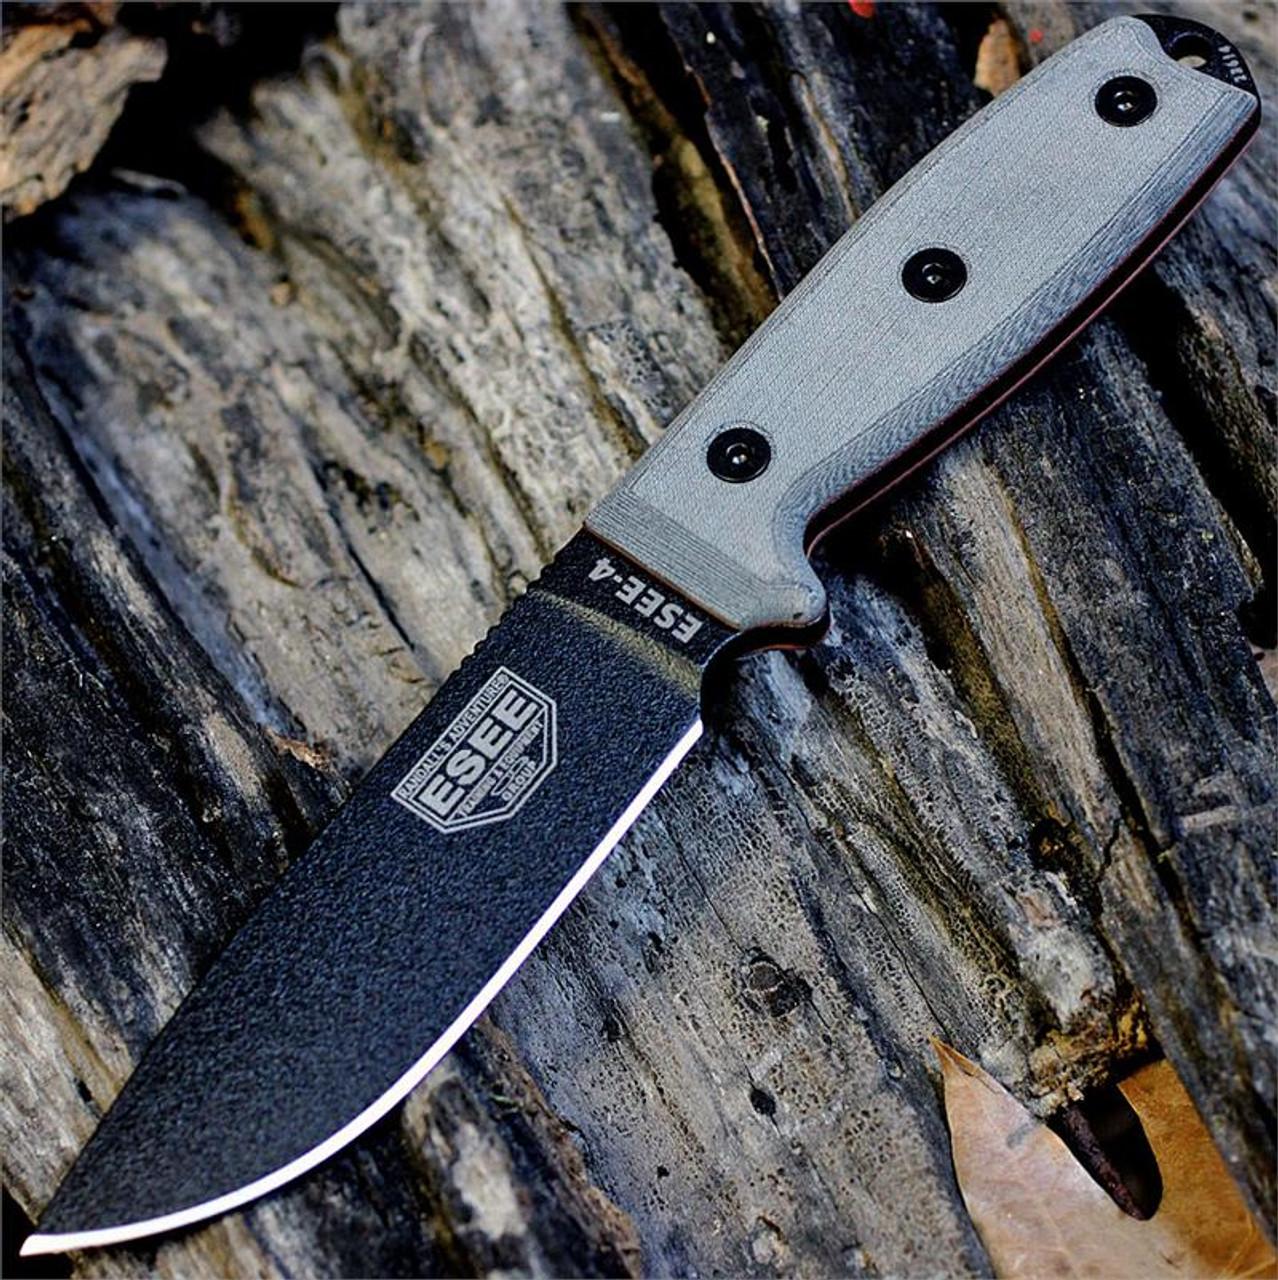 ESEE Knives, 4P-KO, Black Blade, Plain Edge, Micarta Handle, Knife Only, No Sheathing